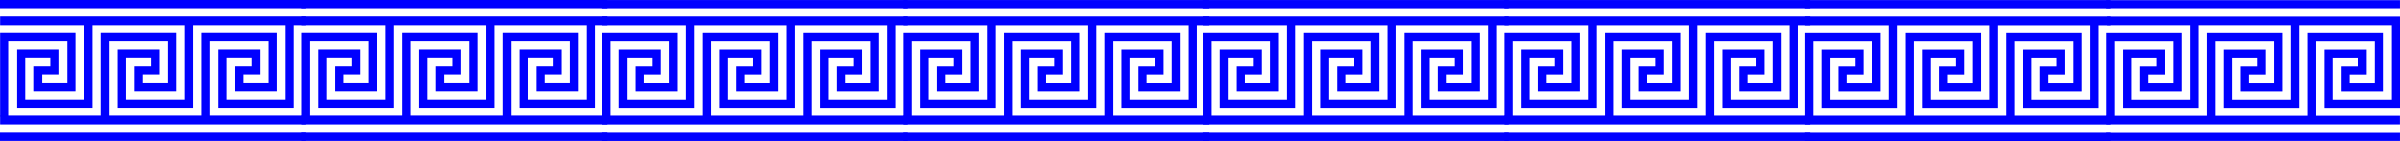 Greek key border clipart png transparent stock Clipart - Blue Greek Key With Lines Border png transparent stock